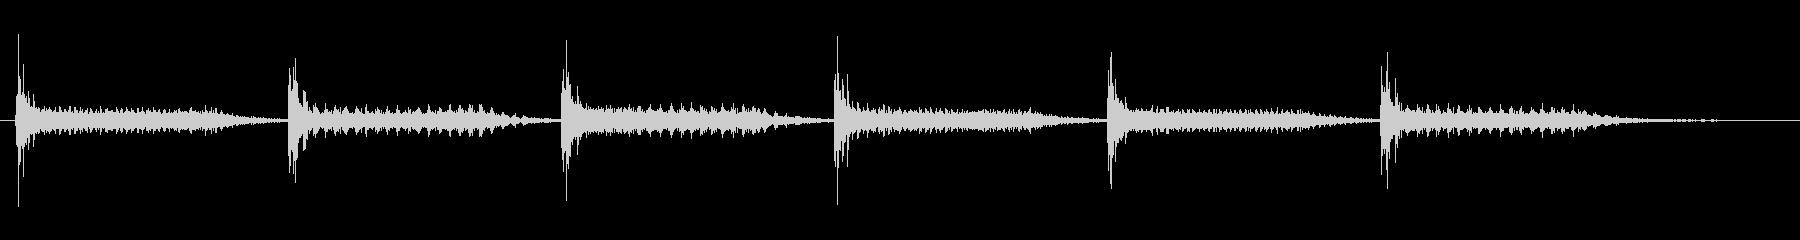 FI デバイス 電子スプラッター02の未再生の波形